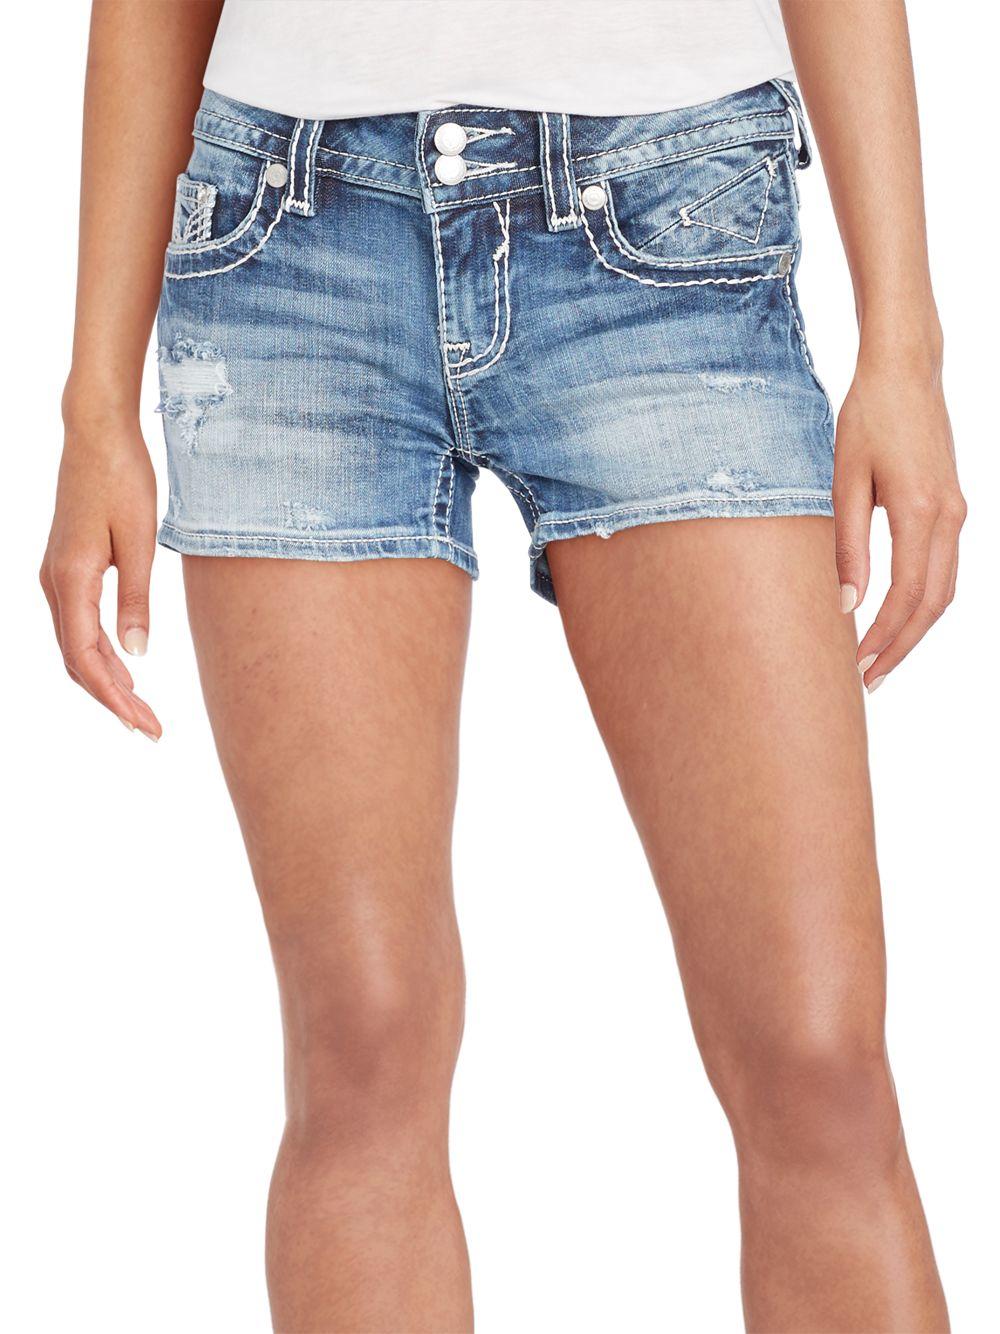 b0c7246f9a Lyst - Vigoss Distressed Denim Shorts in Blue